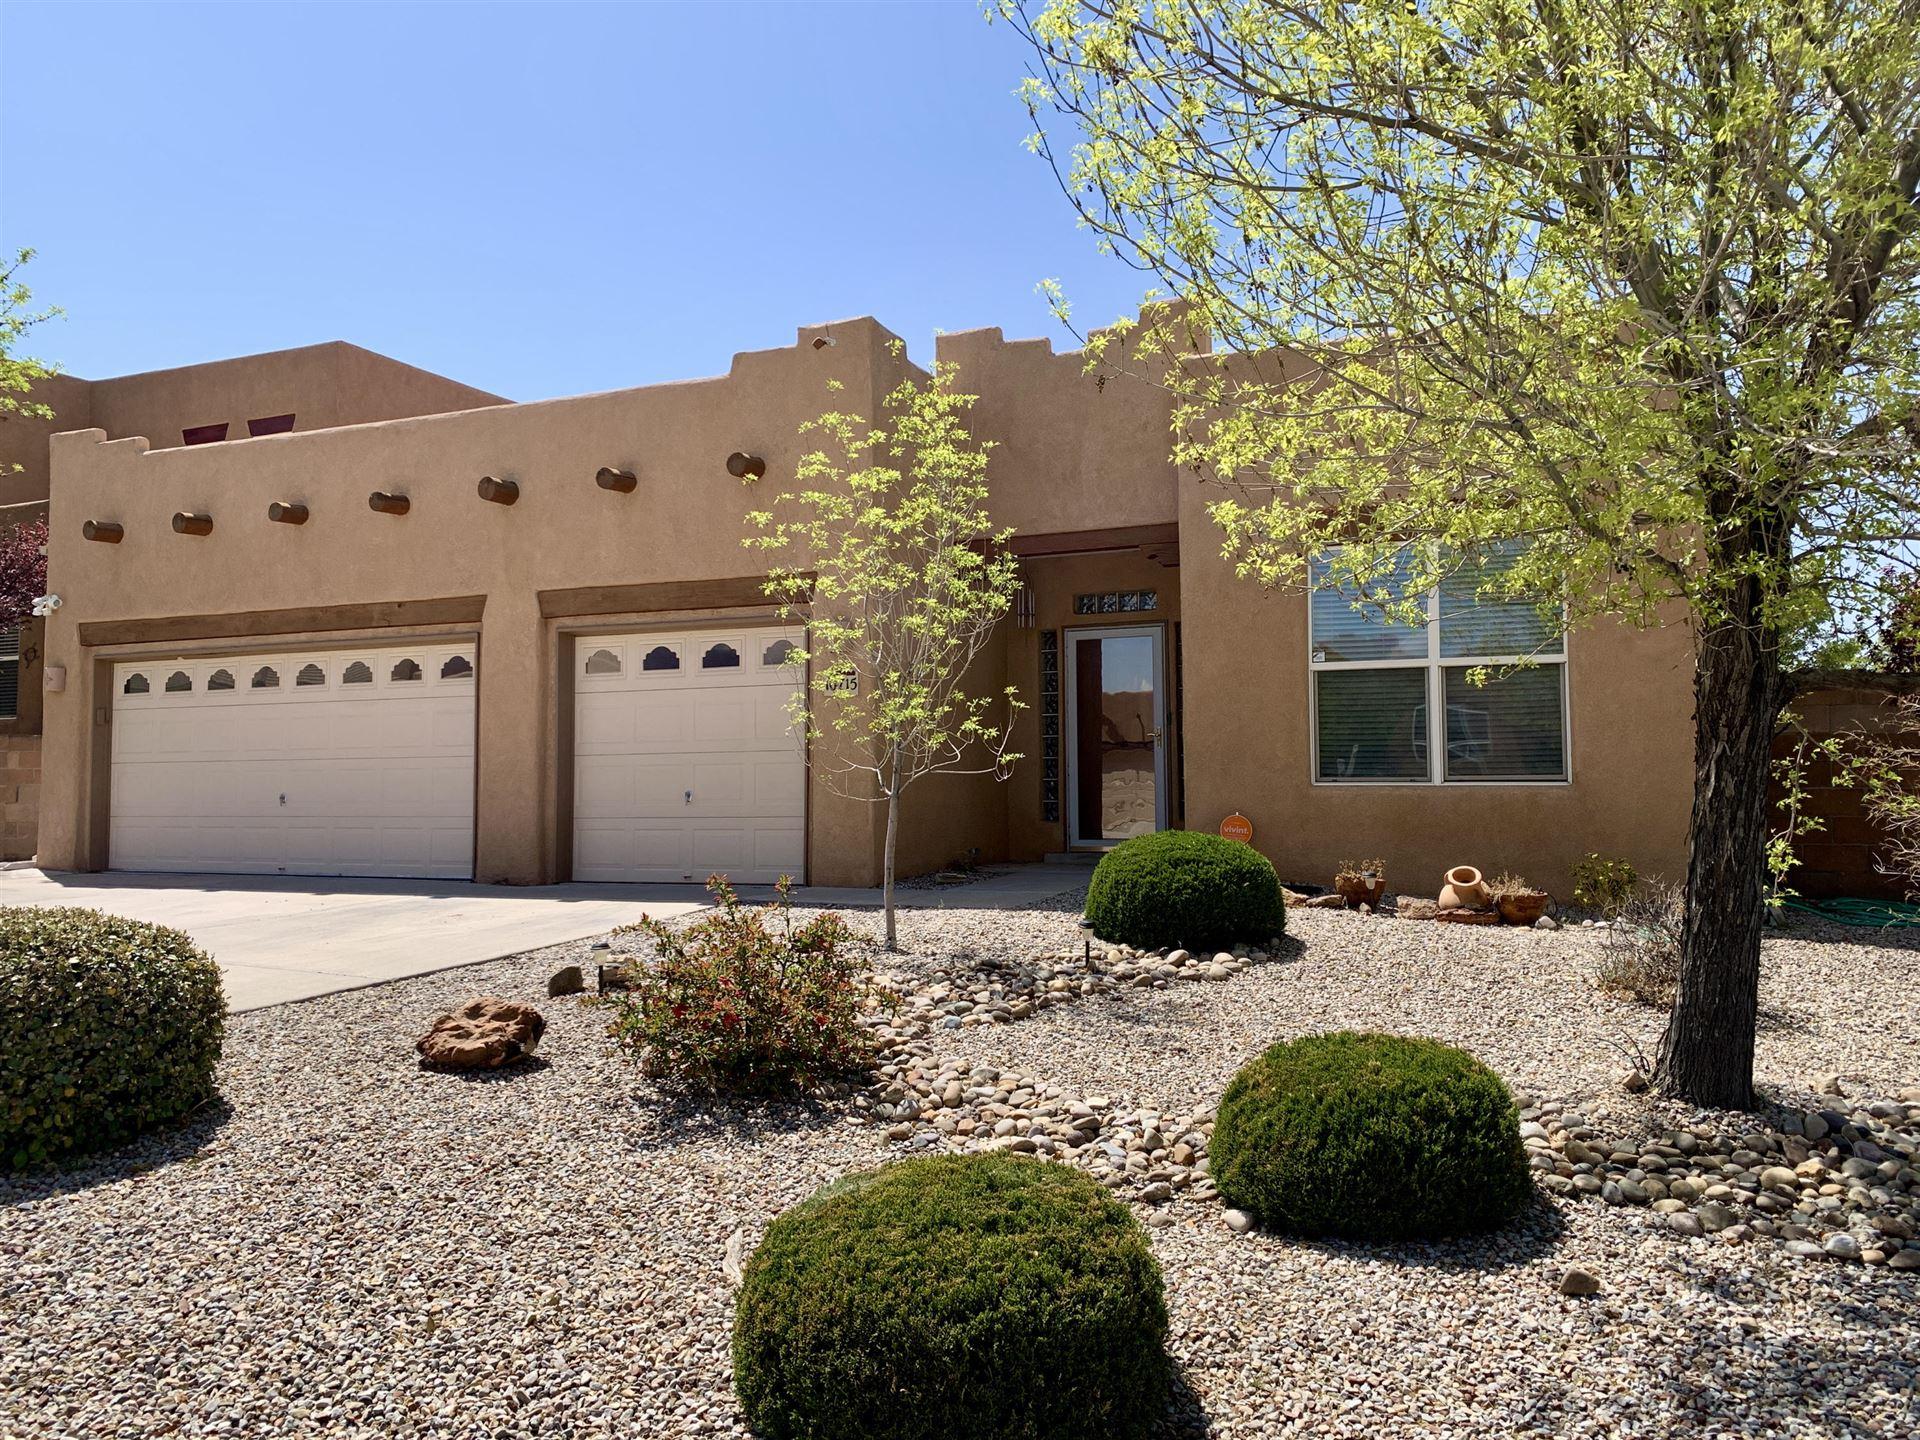 Photo of 10715 ROCKY MOUNTAIN Drive NW, Albuquerque, NM 87114 (MLS # 989869)